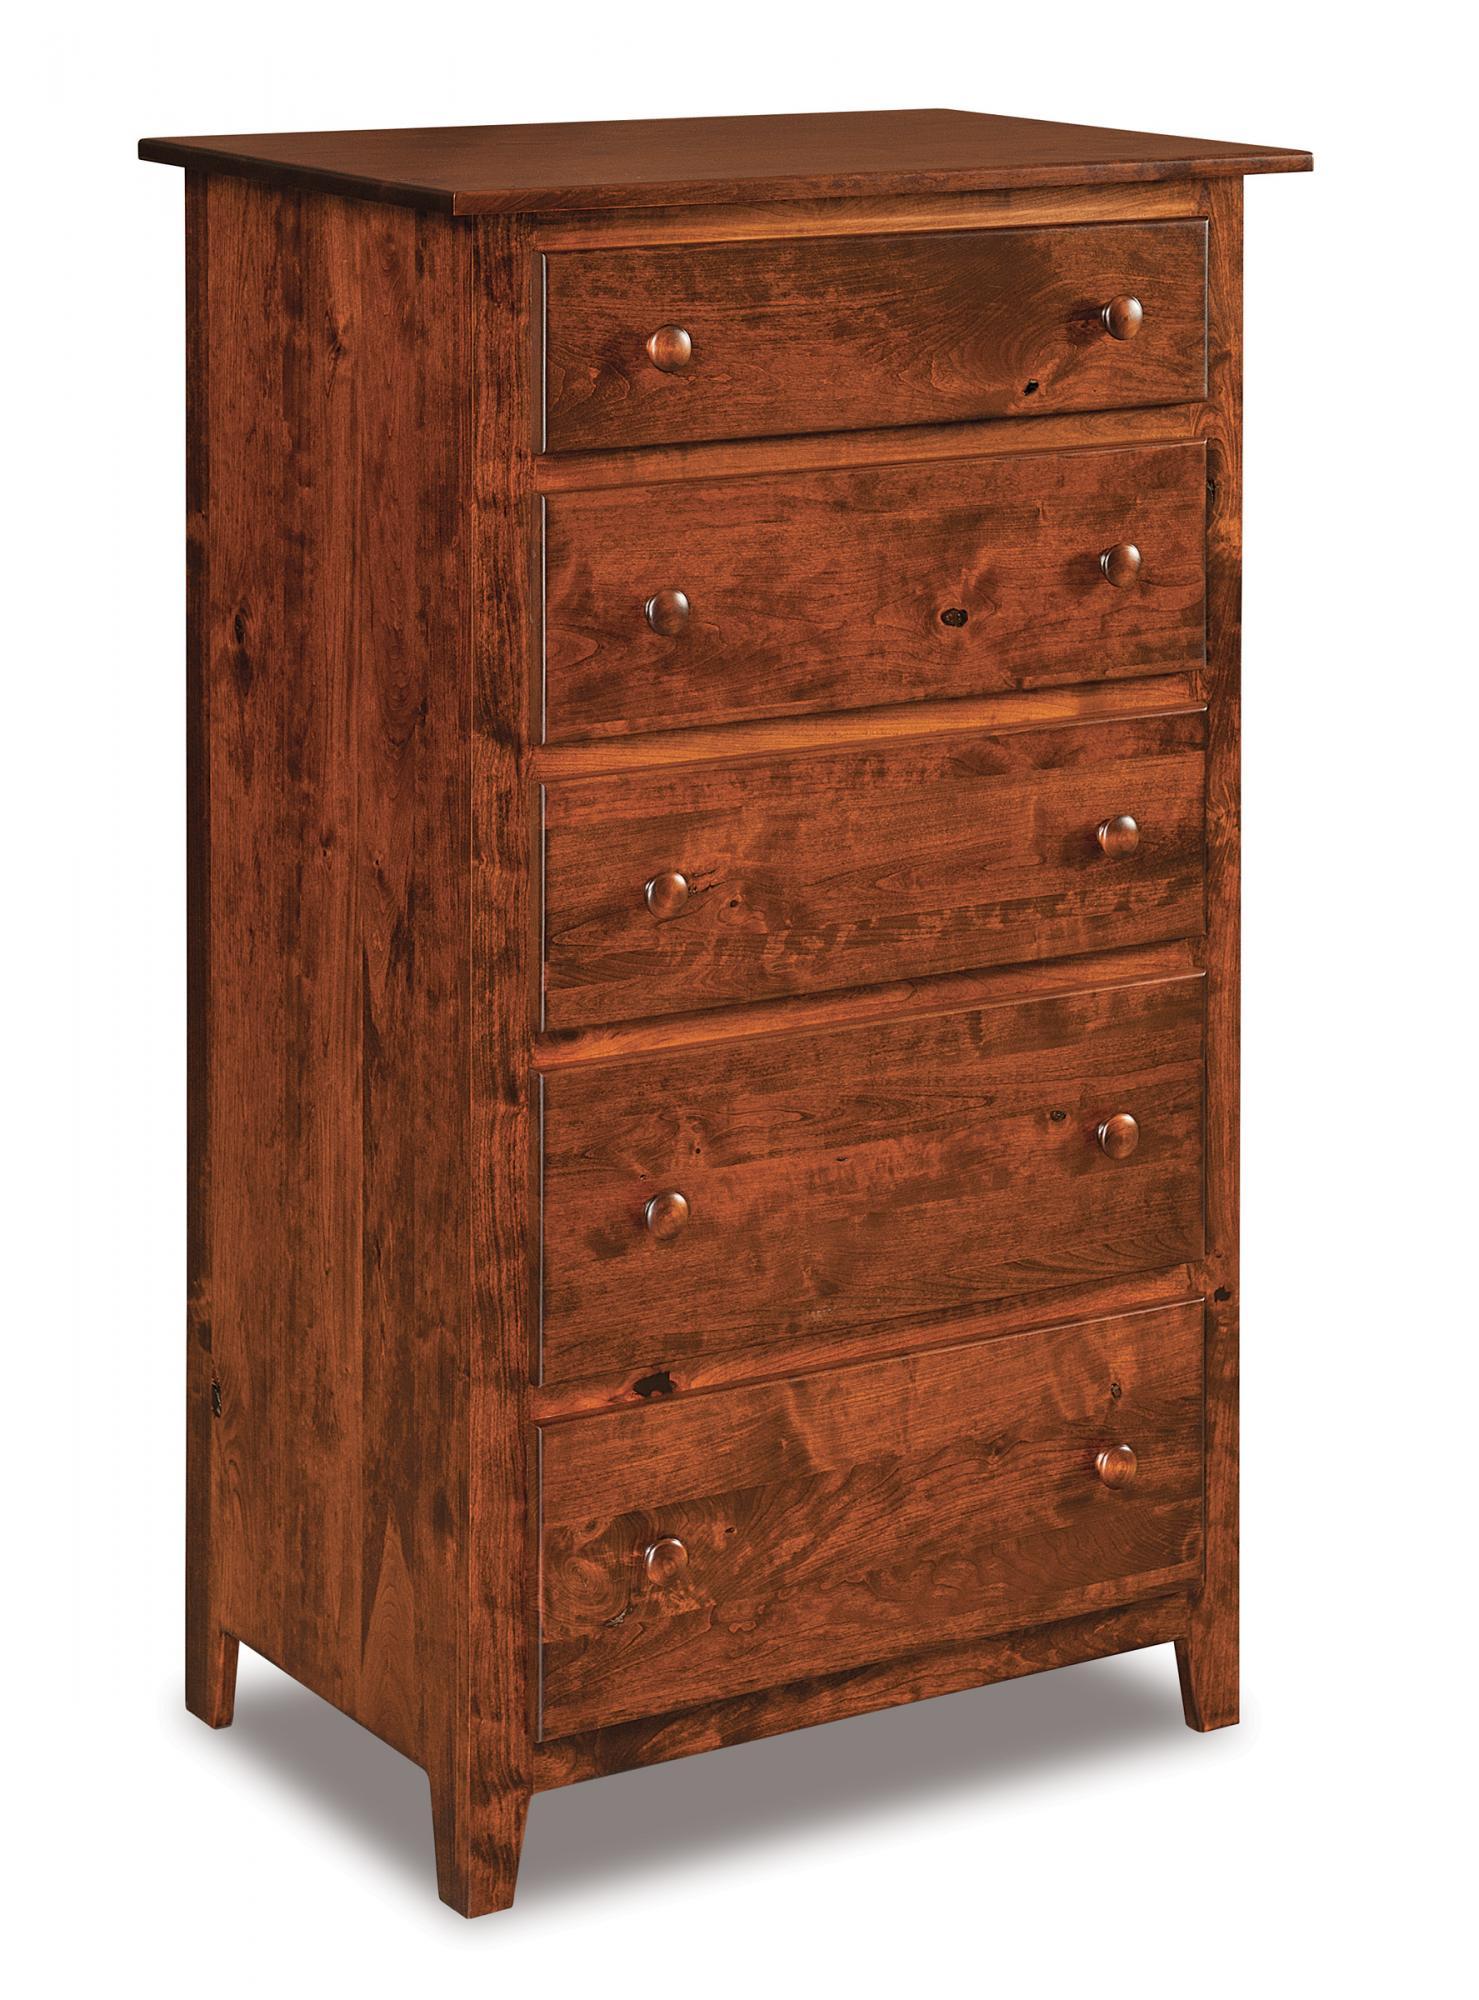 5 Drawer Chest Amish Furniture Store Mankato MN